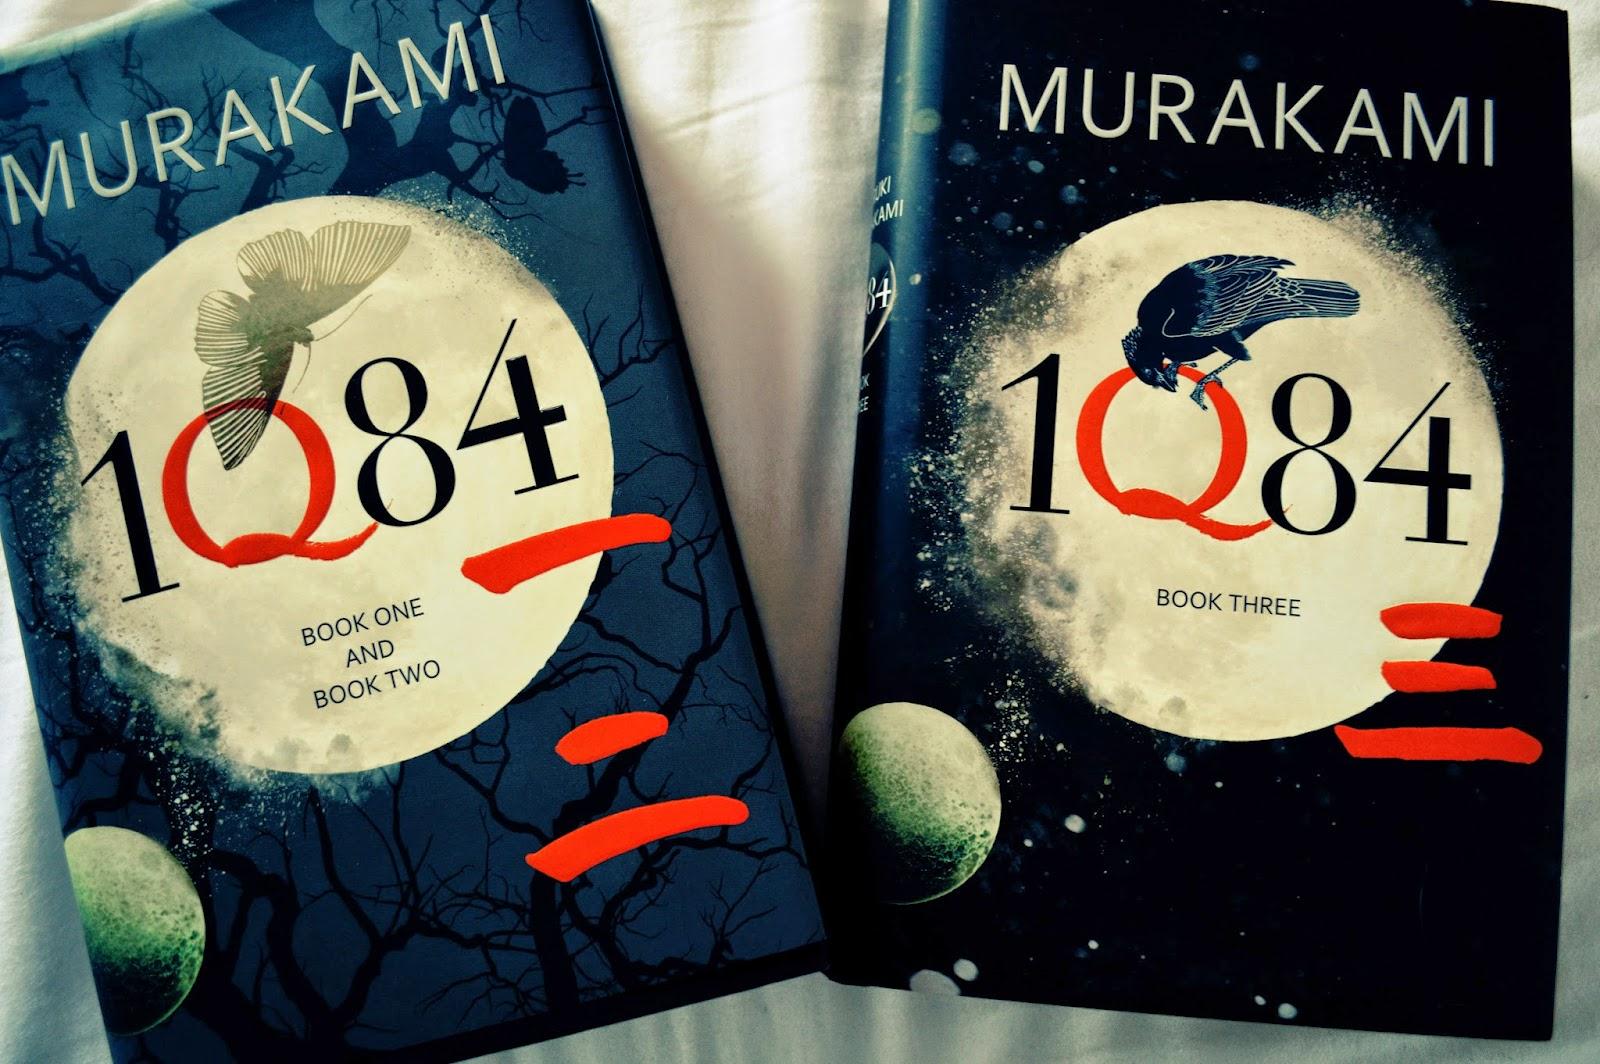 1Q84, Haruki Murakami, book 1 2 and 3, UK edition, photo, photograph, hardback, Japanese, literature,